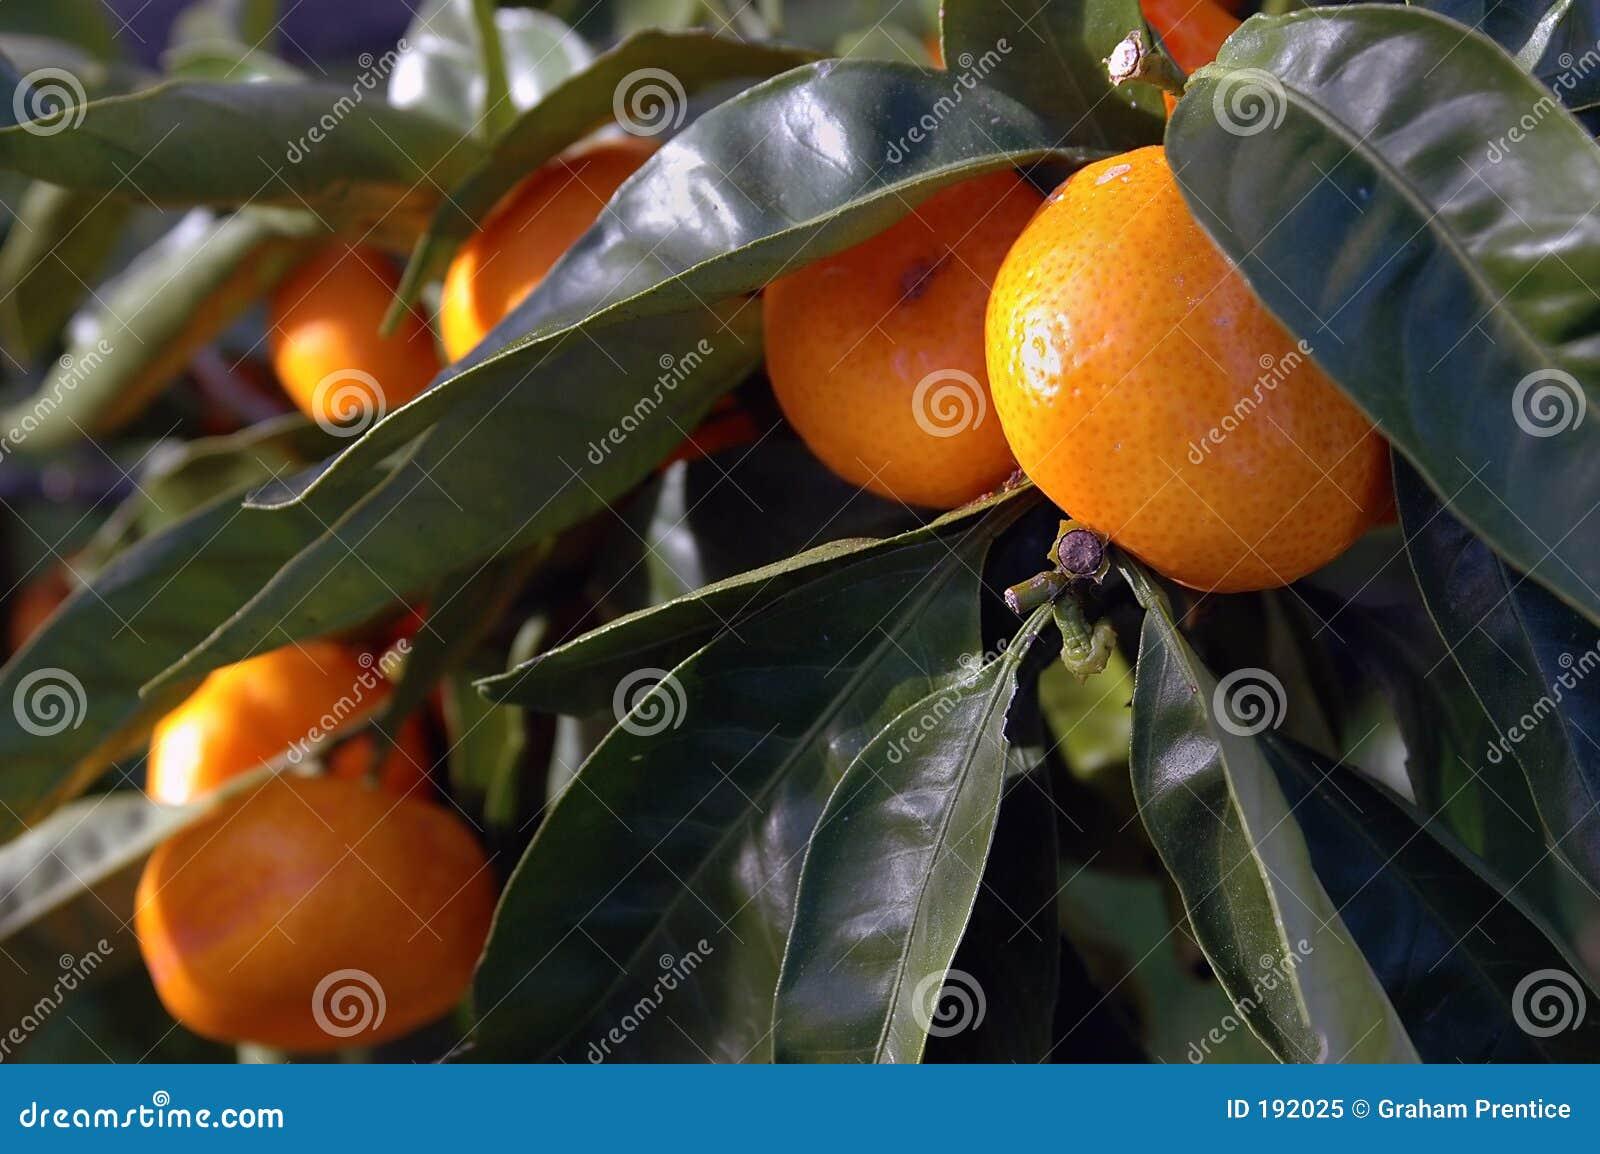 Citrus Fruit Growing